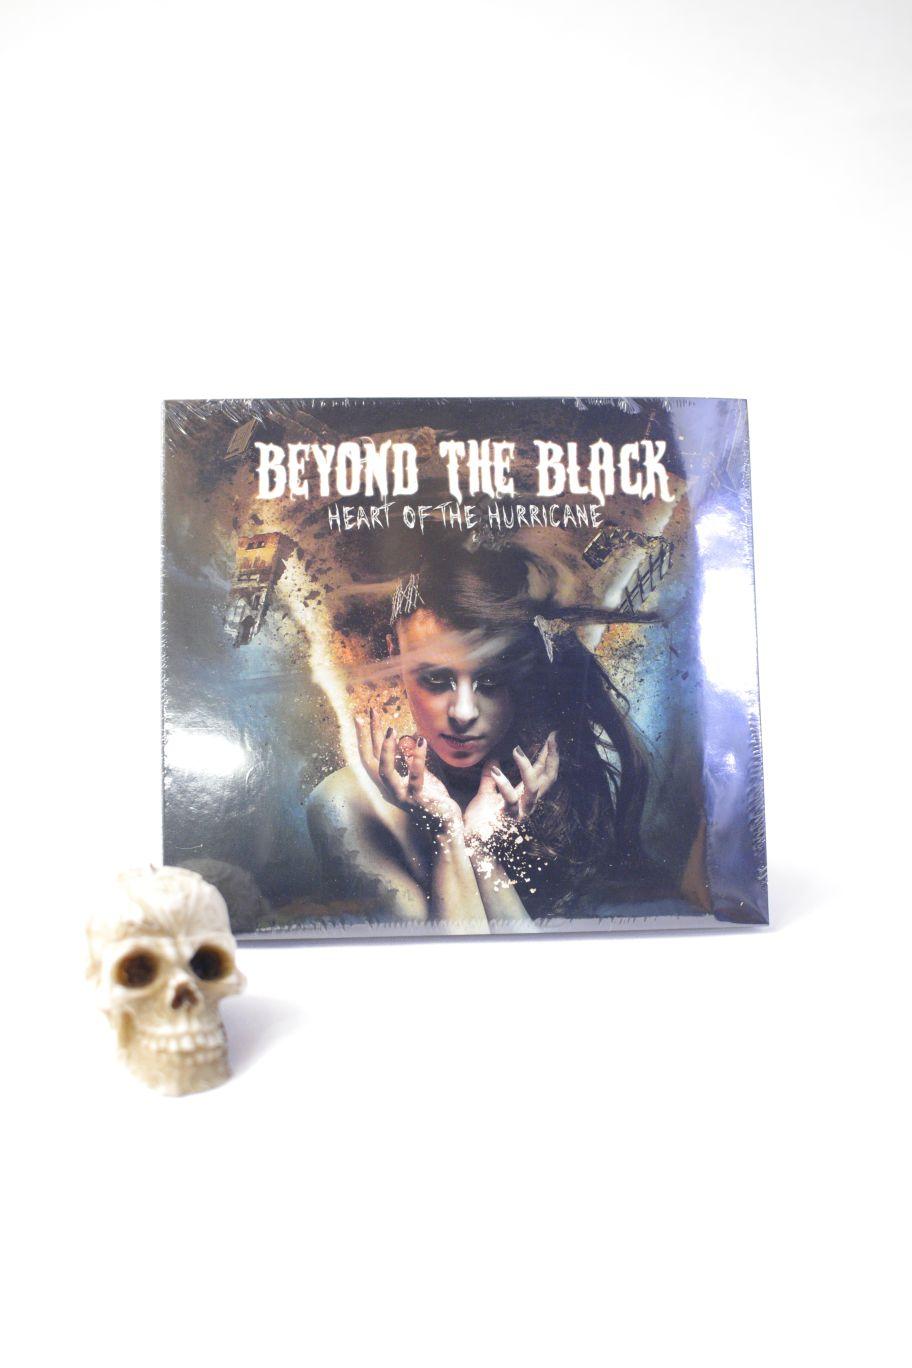 CD BEYOND THE BLACK HEART OF THE HURRICANE